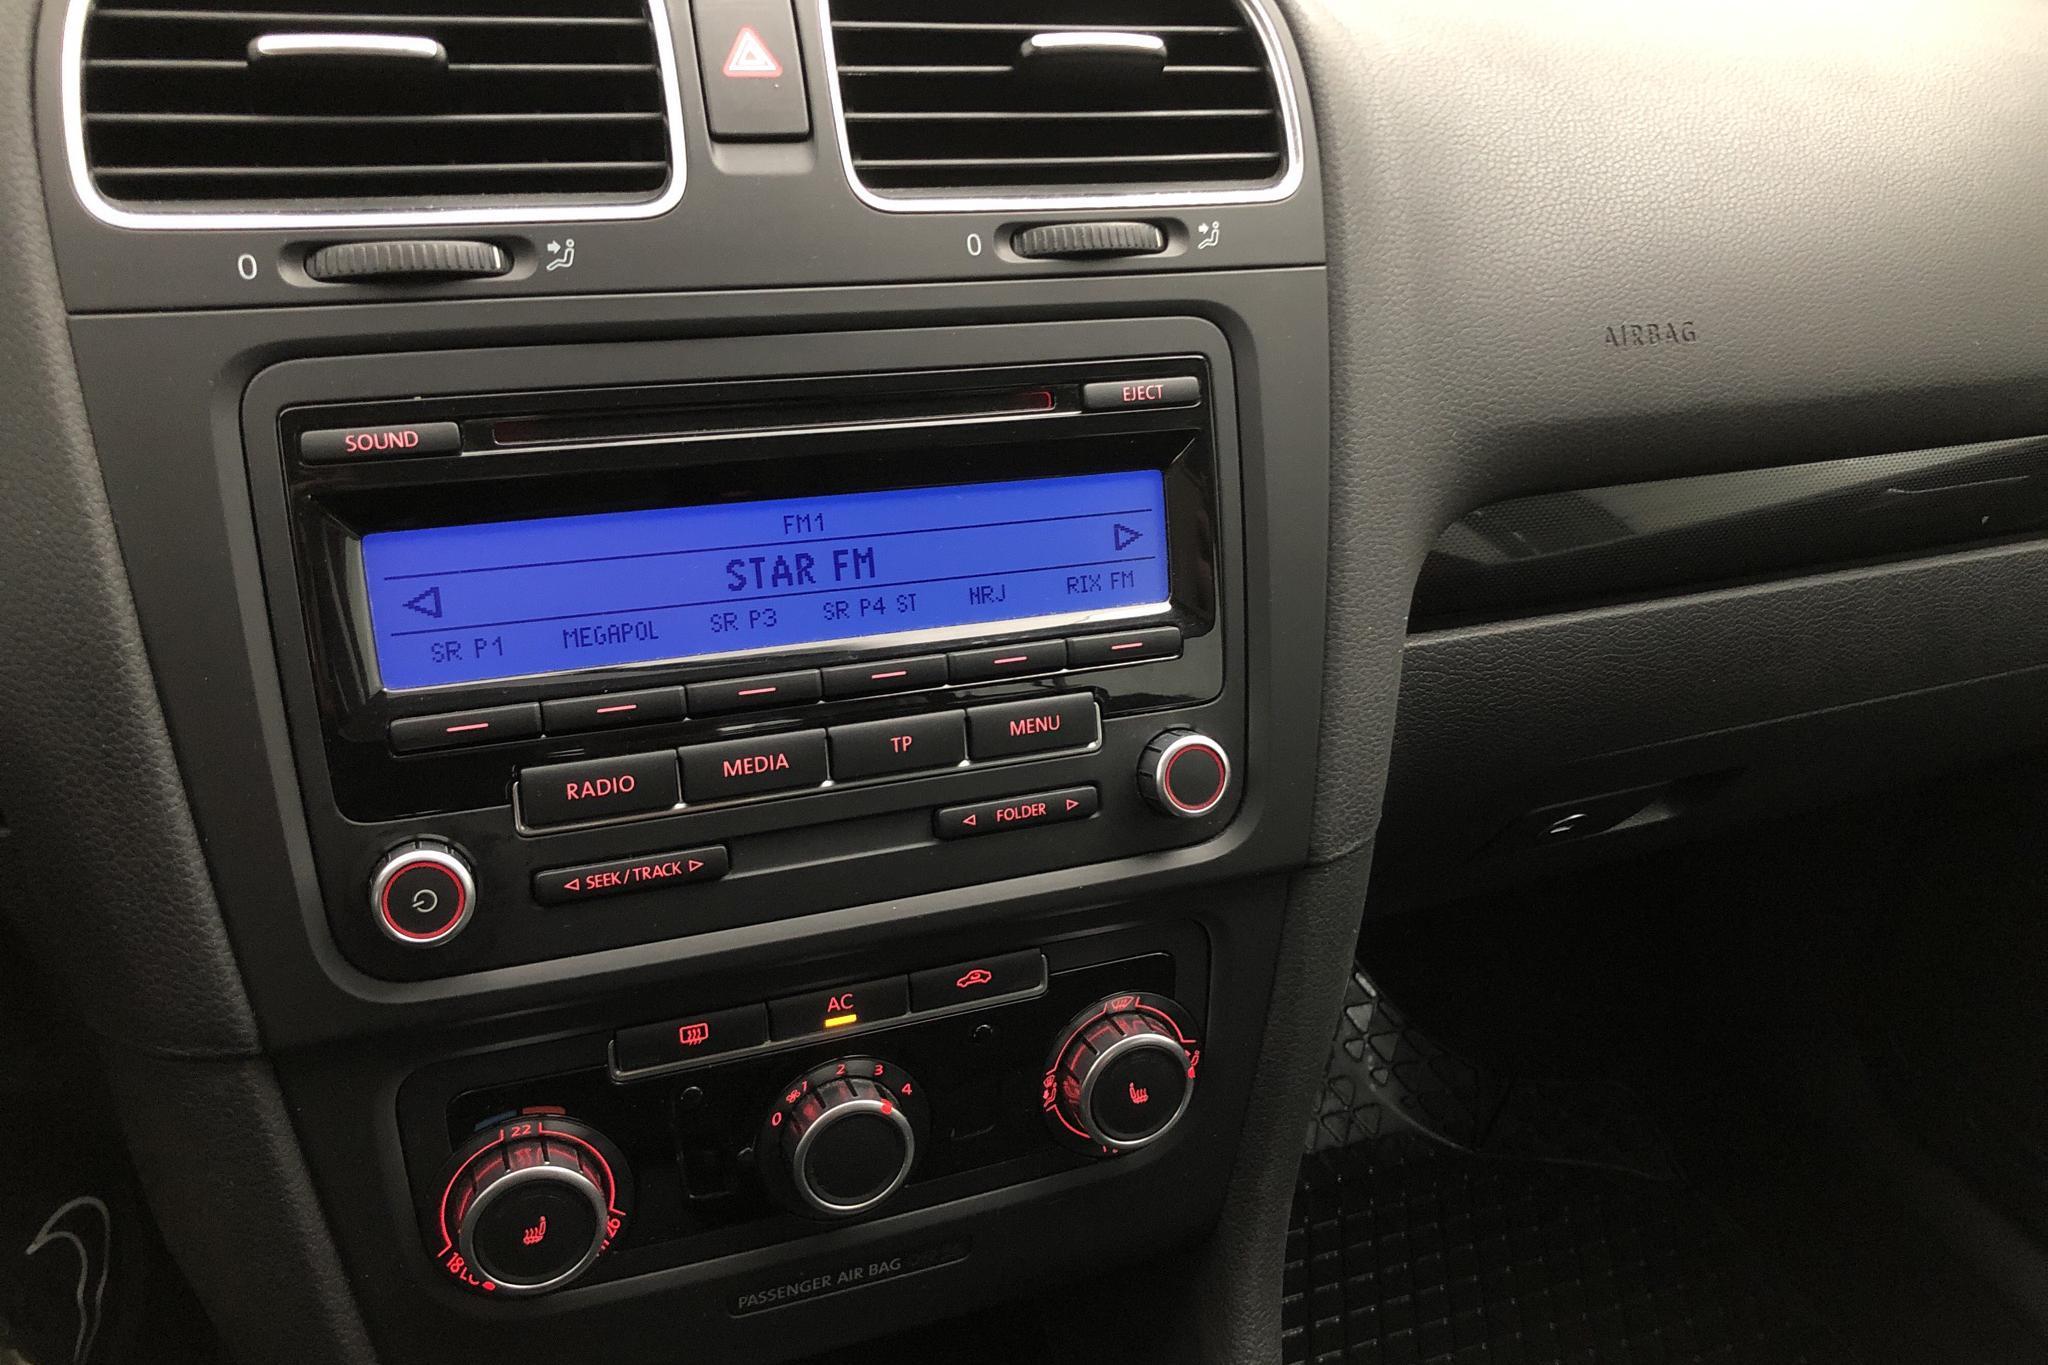 VW Golf VI 1.4 TSI 5dr (122hk) - 65 000 km - Manual - red - 2009